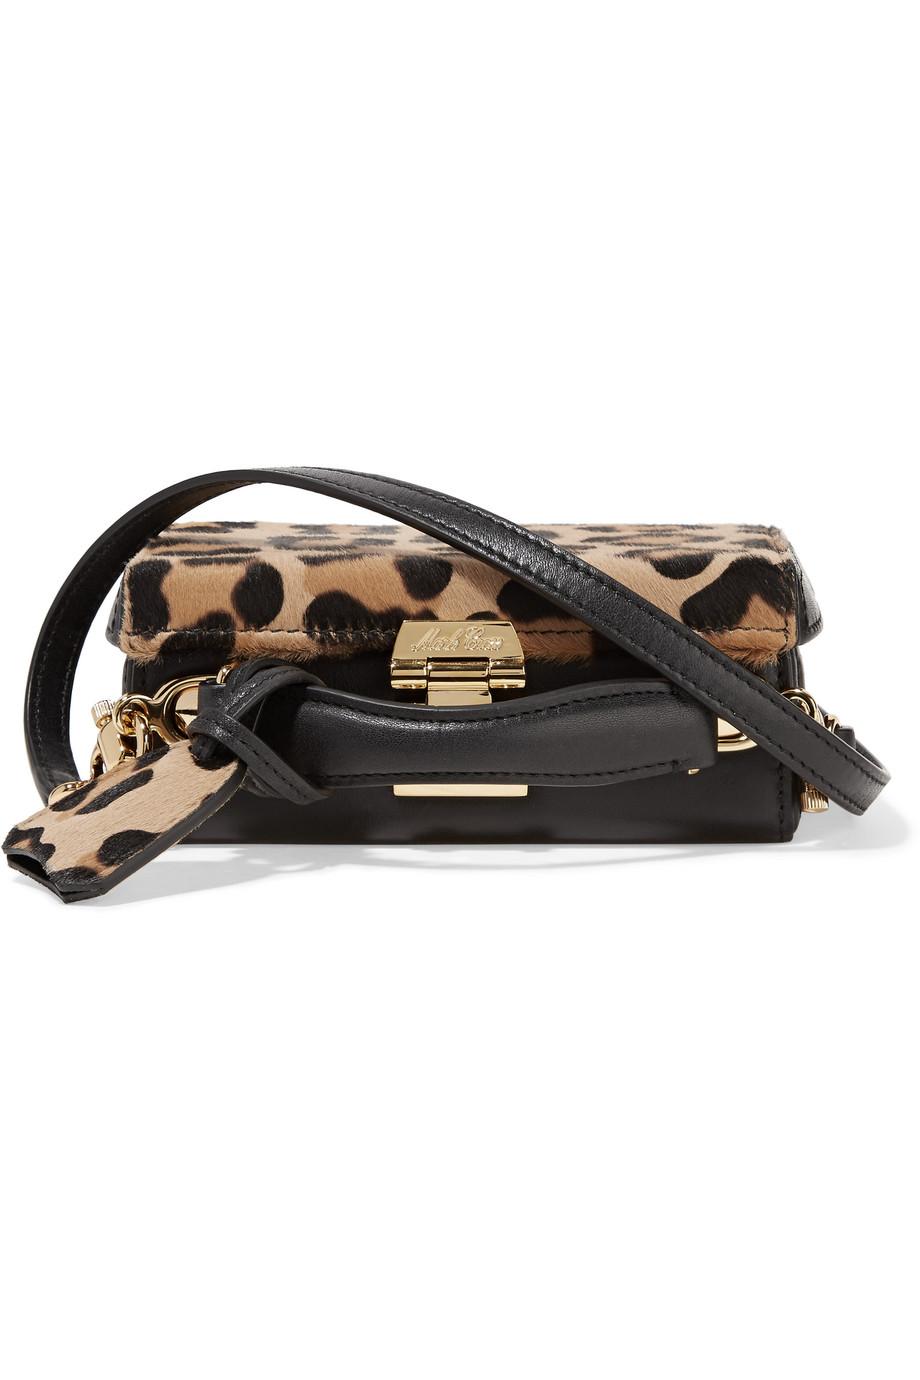 Mark Cross Grace Mini Leopard-Print Calf Hair and Leather Shoulder Bag, Leopard Print, Women's